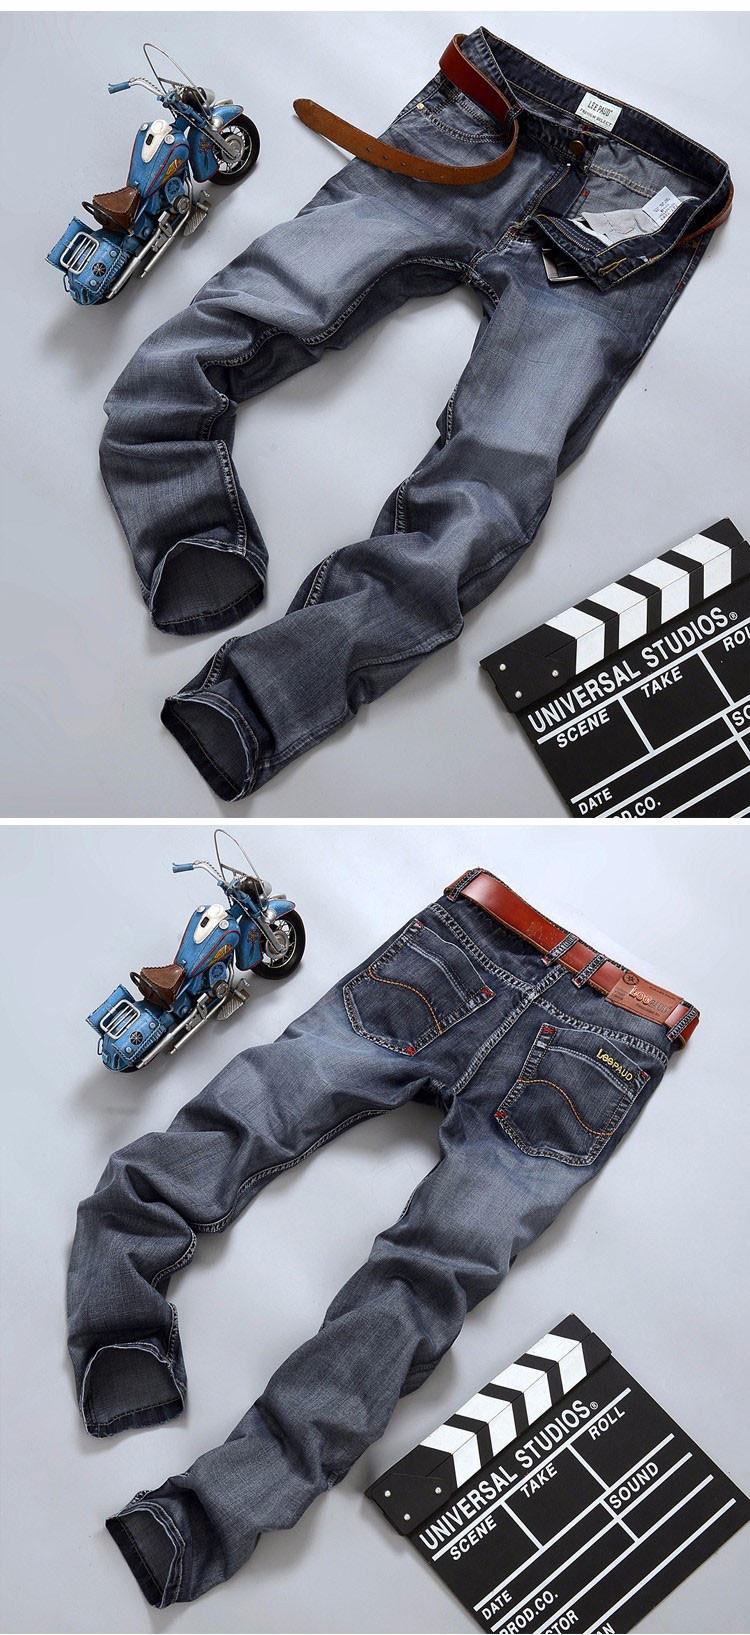 Retro-style gray denim brand jeans Slim Straight jeans mature men choose advanced fabric softening